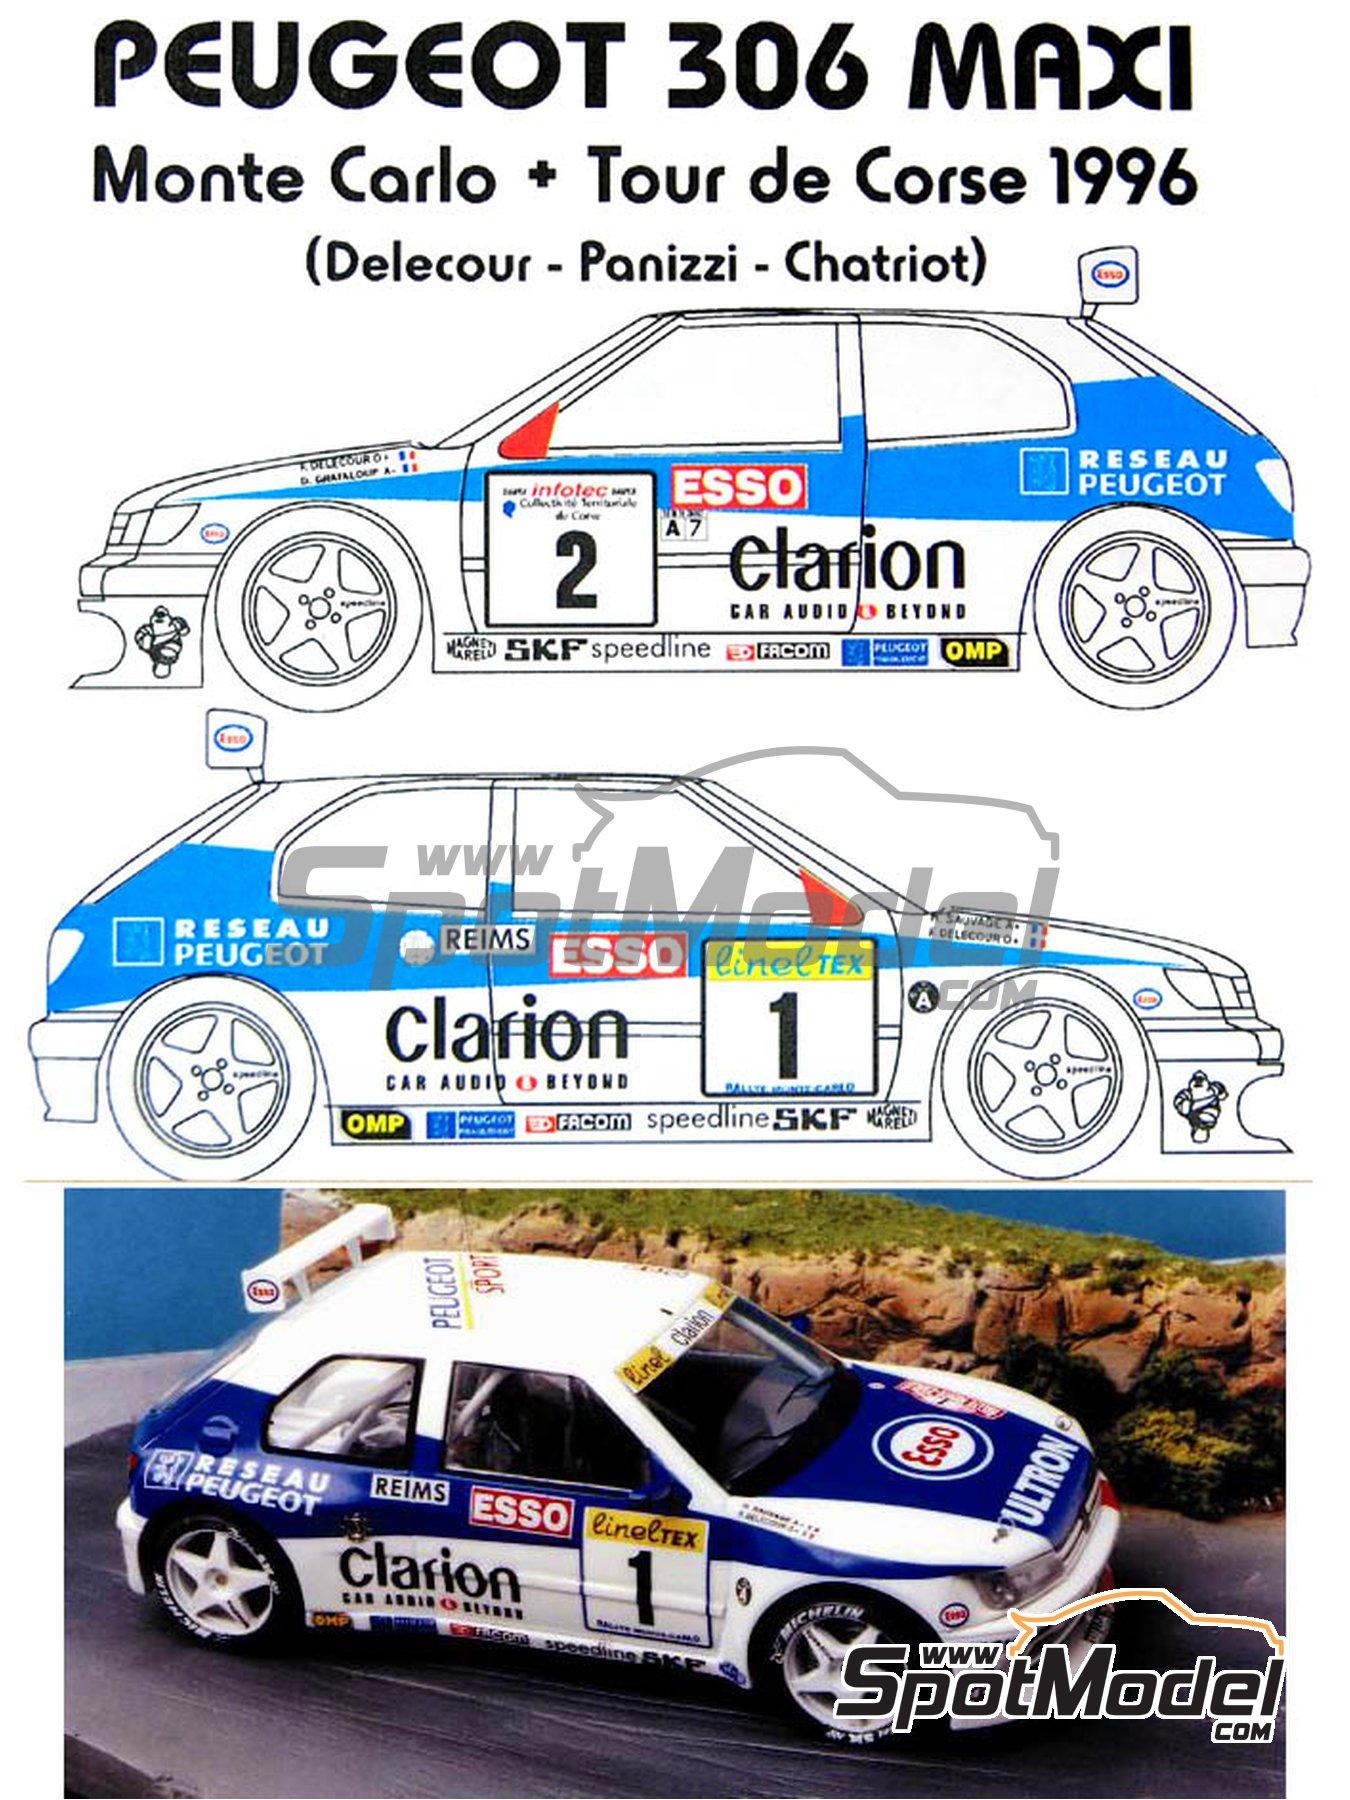 Renaissance Models: Model car kit 1/24 scale - Peugeot 306 Maxi Evo ...